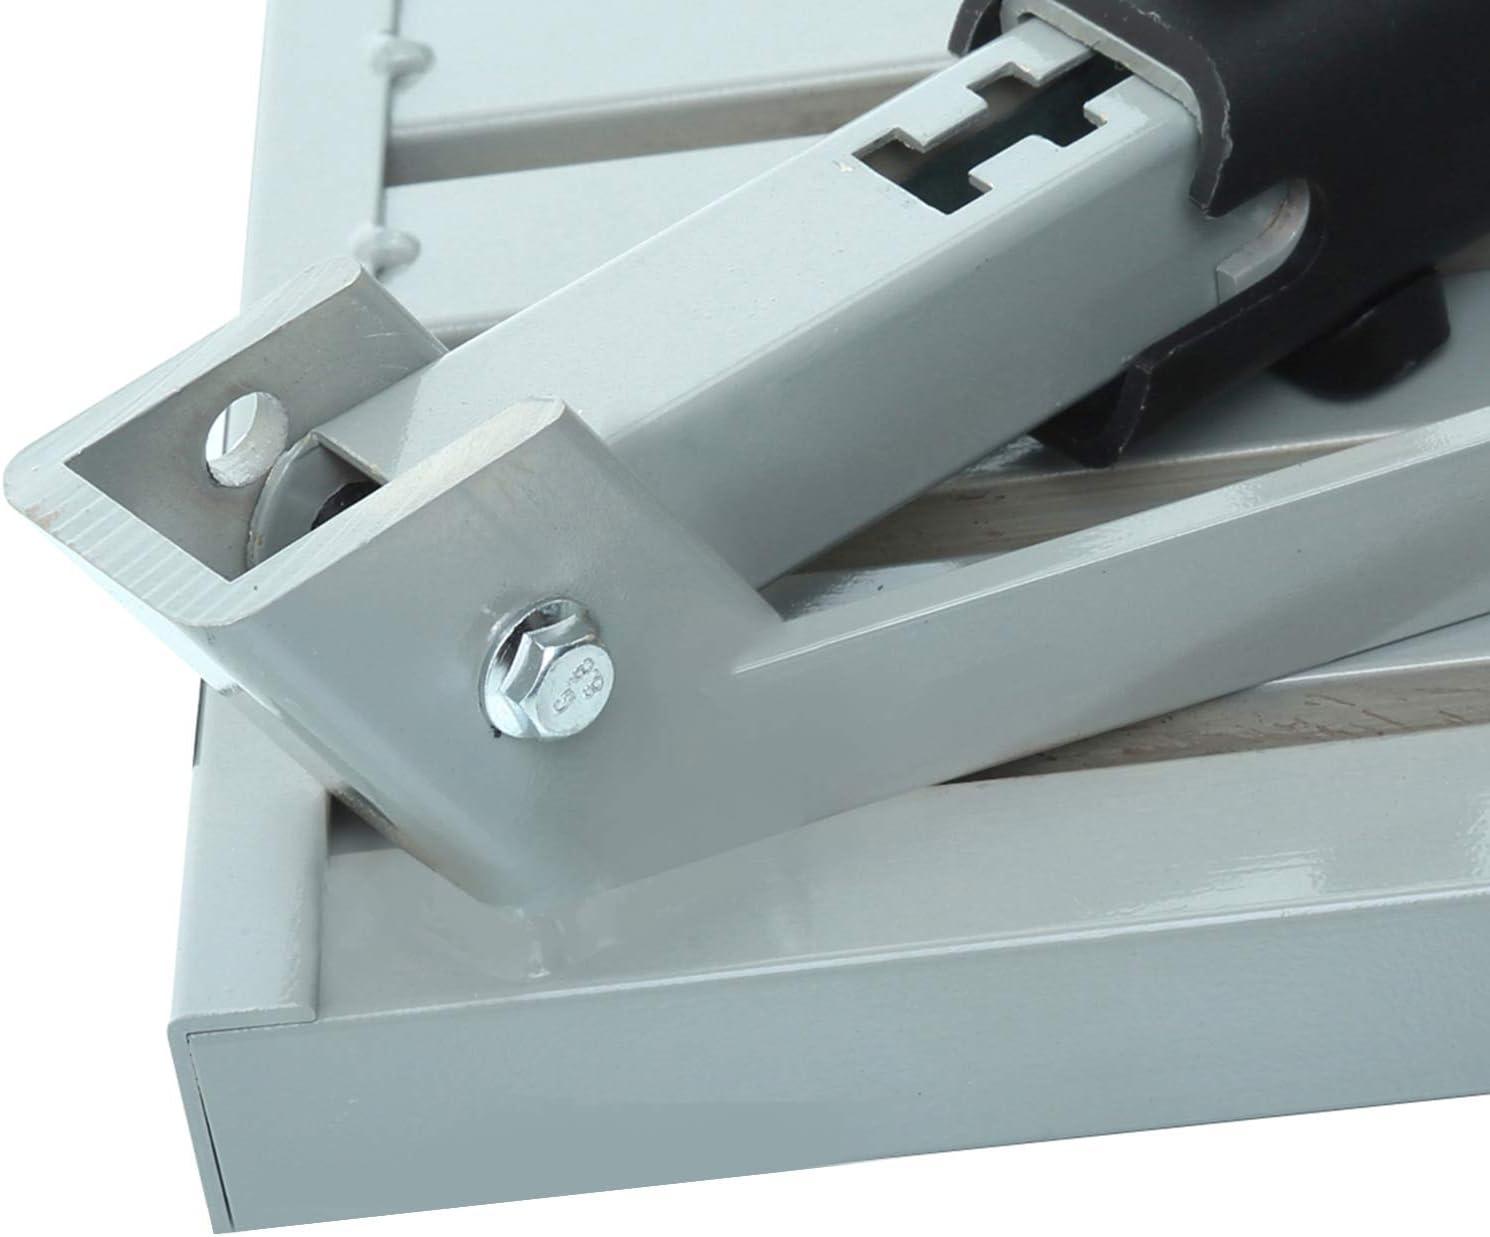 1,500lbs Adjustable Height Aluminum Folding Platform Step with Sheath Non-Slip Rubber Feet RV T Level RV Steps Homeon Wheels 19 x 14.5 Large RV Step Stool Handle Reflective Stripe